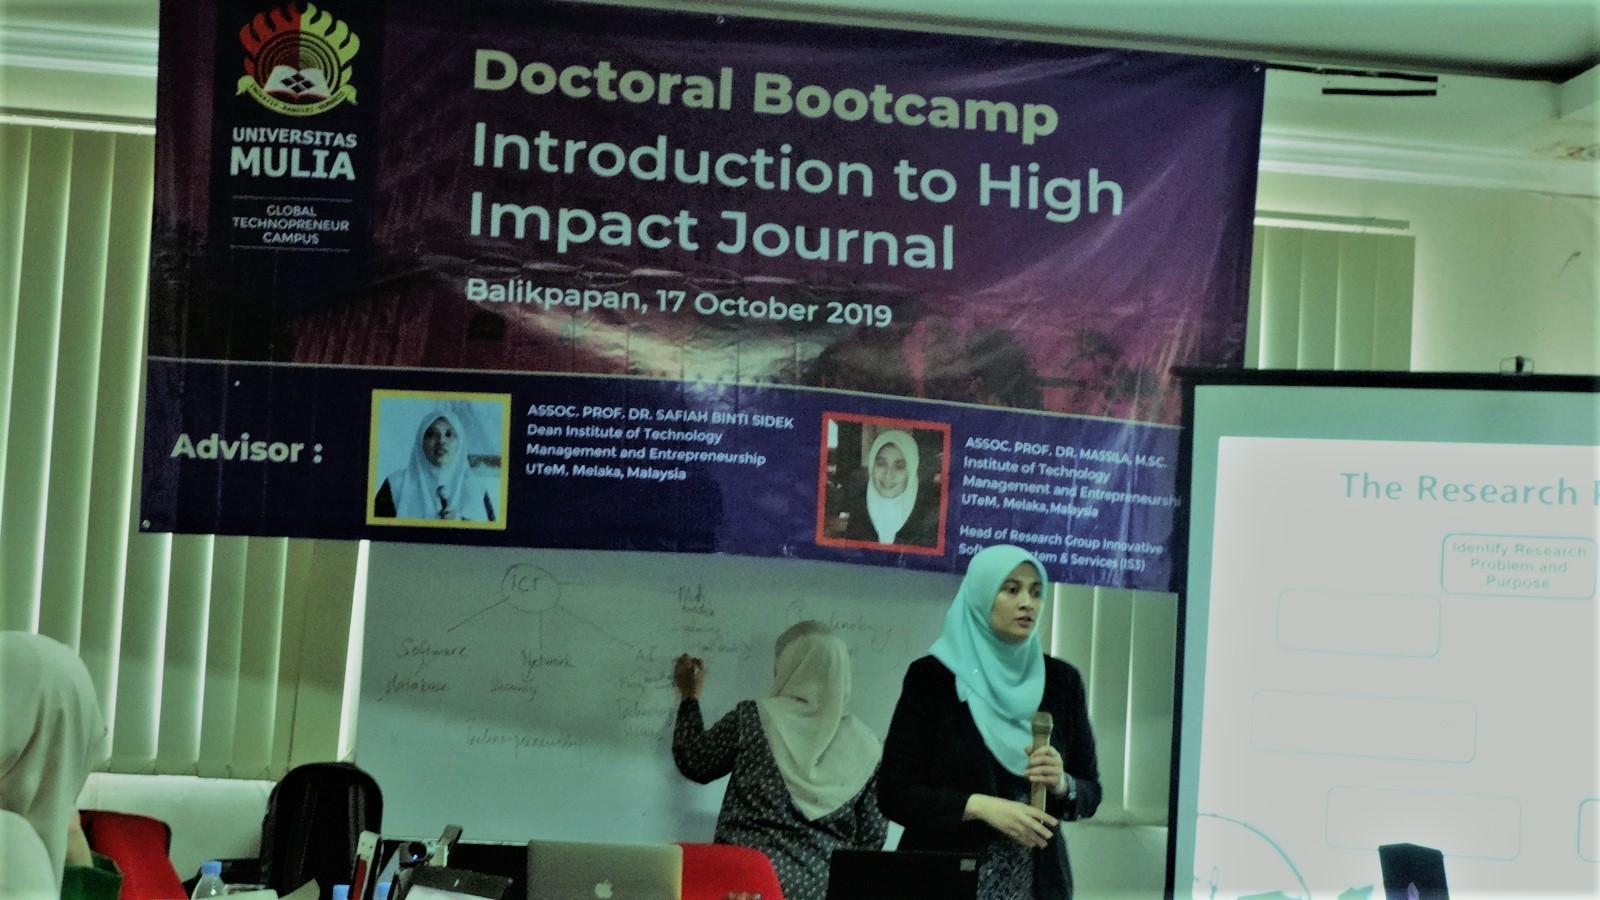 Prof. Dr Masilla MSc dari Universitas Teknologi Melaka Malaysia, Kamis (17/10). Foto: dok. pribadi